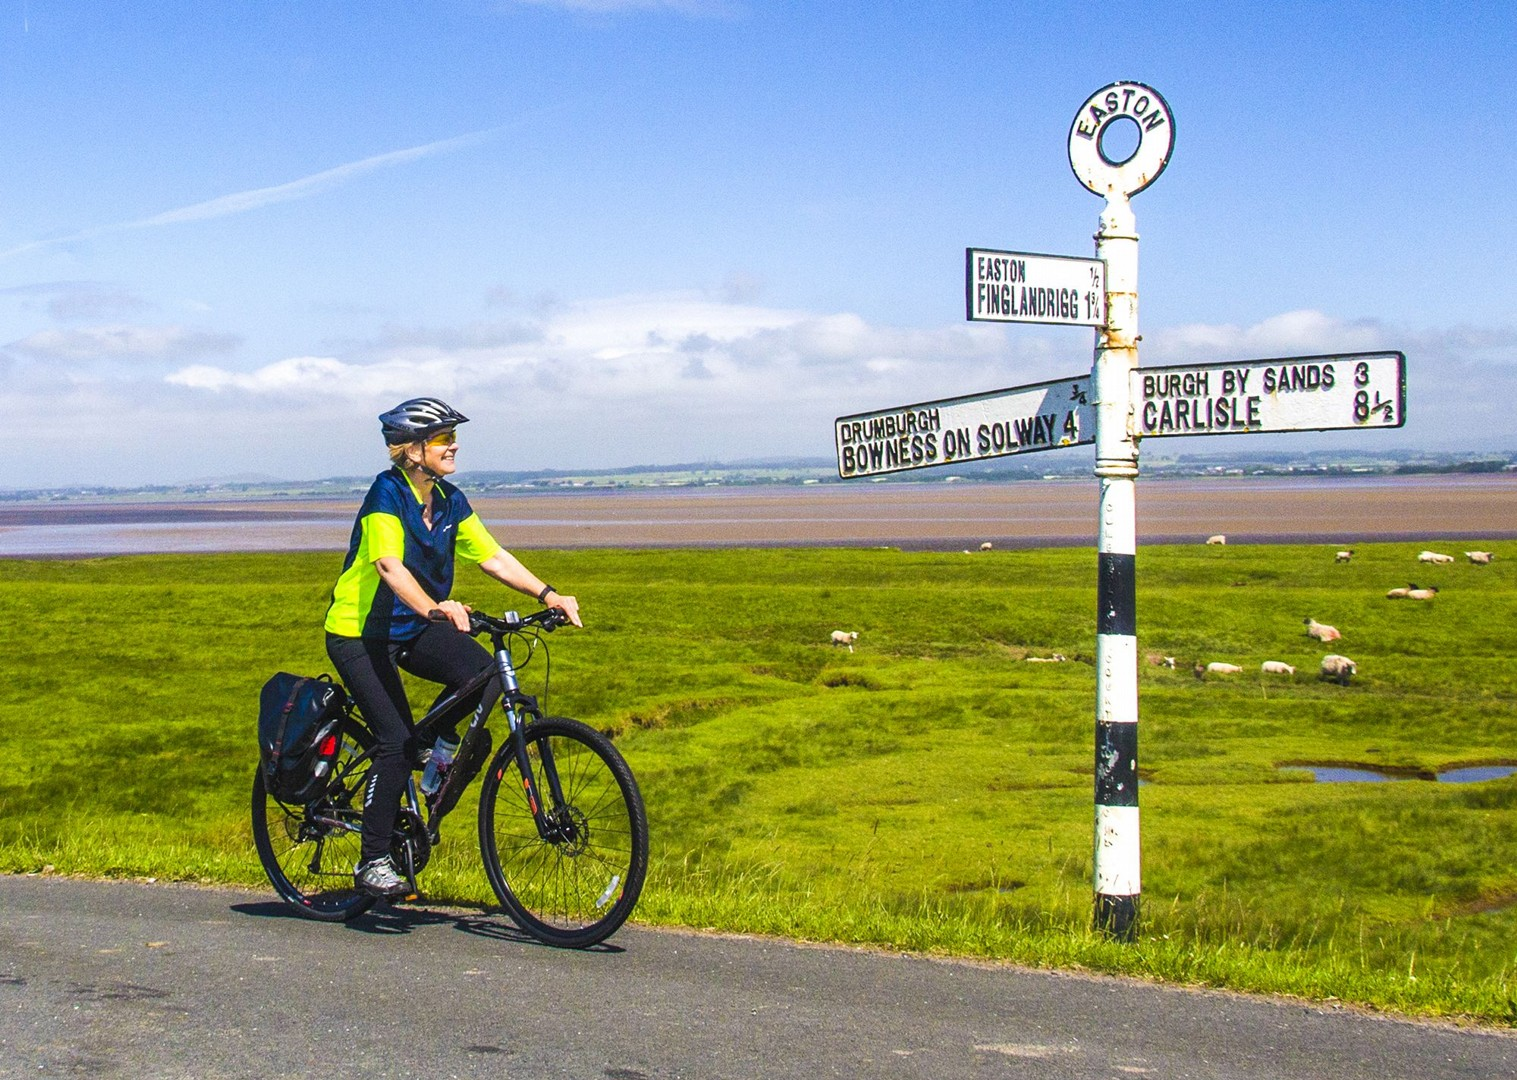 1706_0149-2.jpg - UK - Hadrian's Cycleway - 4 Days Cycling - Self-Guided Leisure Cycling Holiday - Leisure Cycling